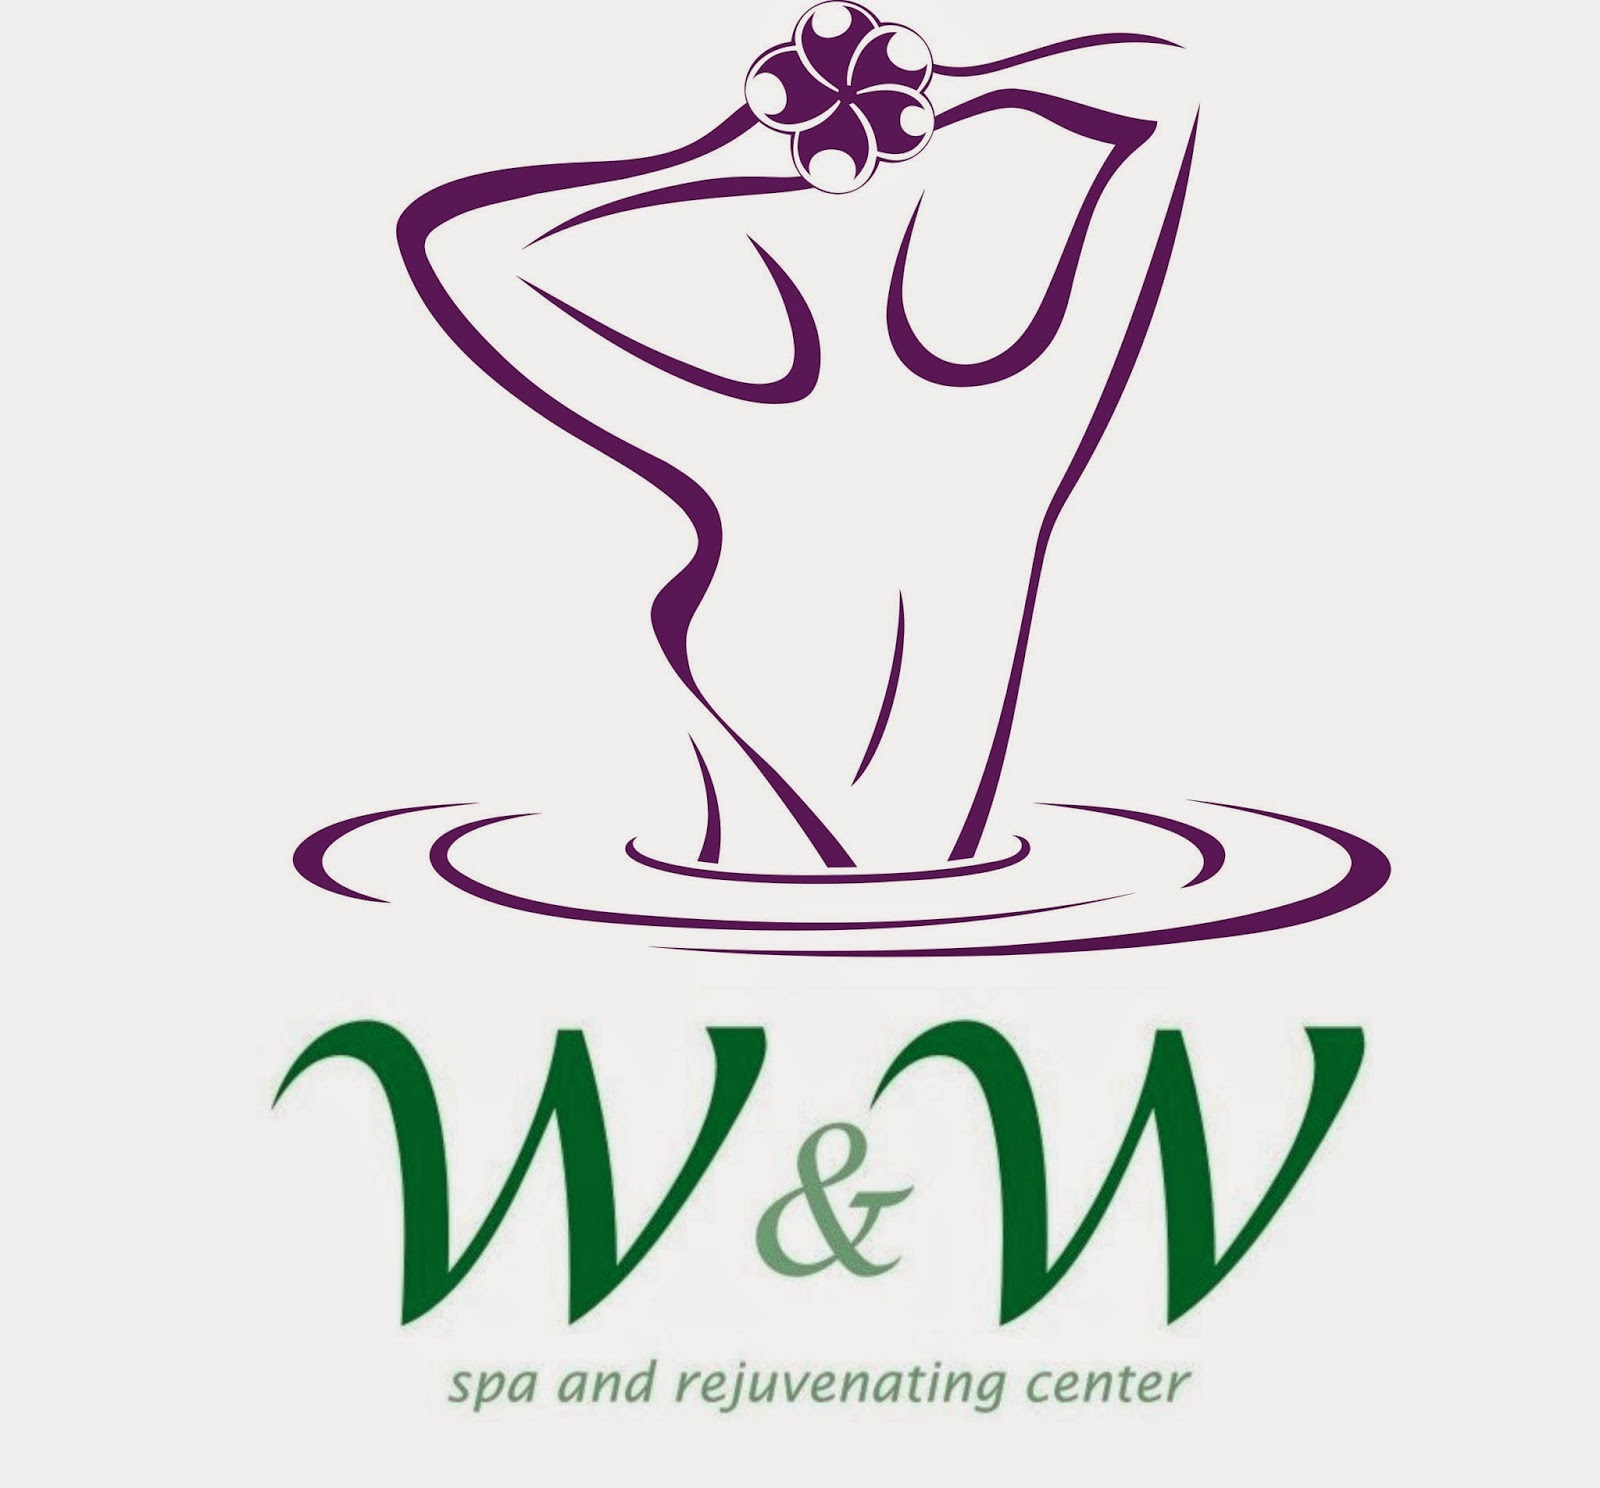 Lowongan Spa Therapist Di Ww Spa Yogyakarta Ada